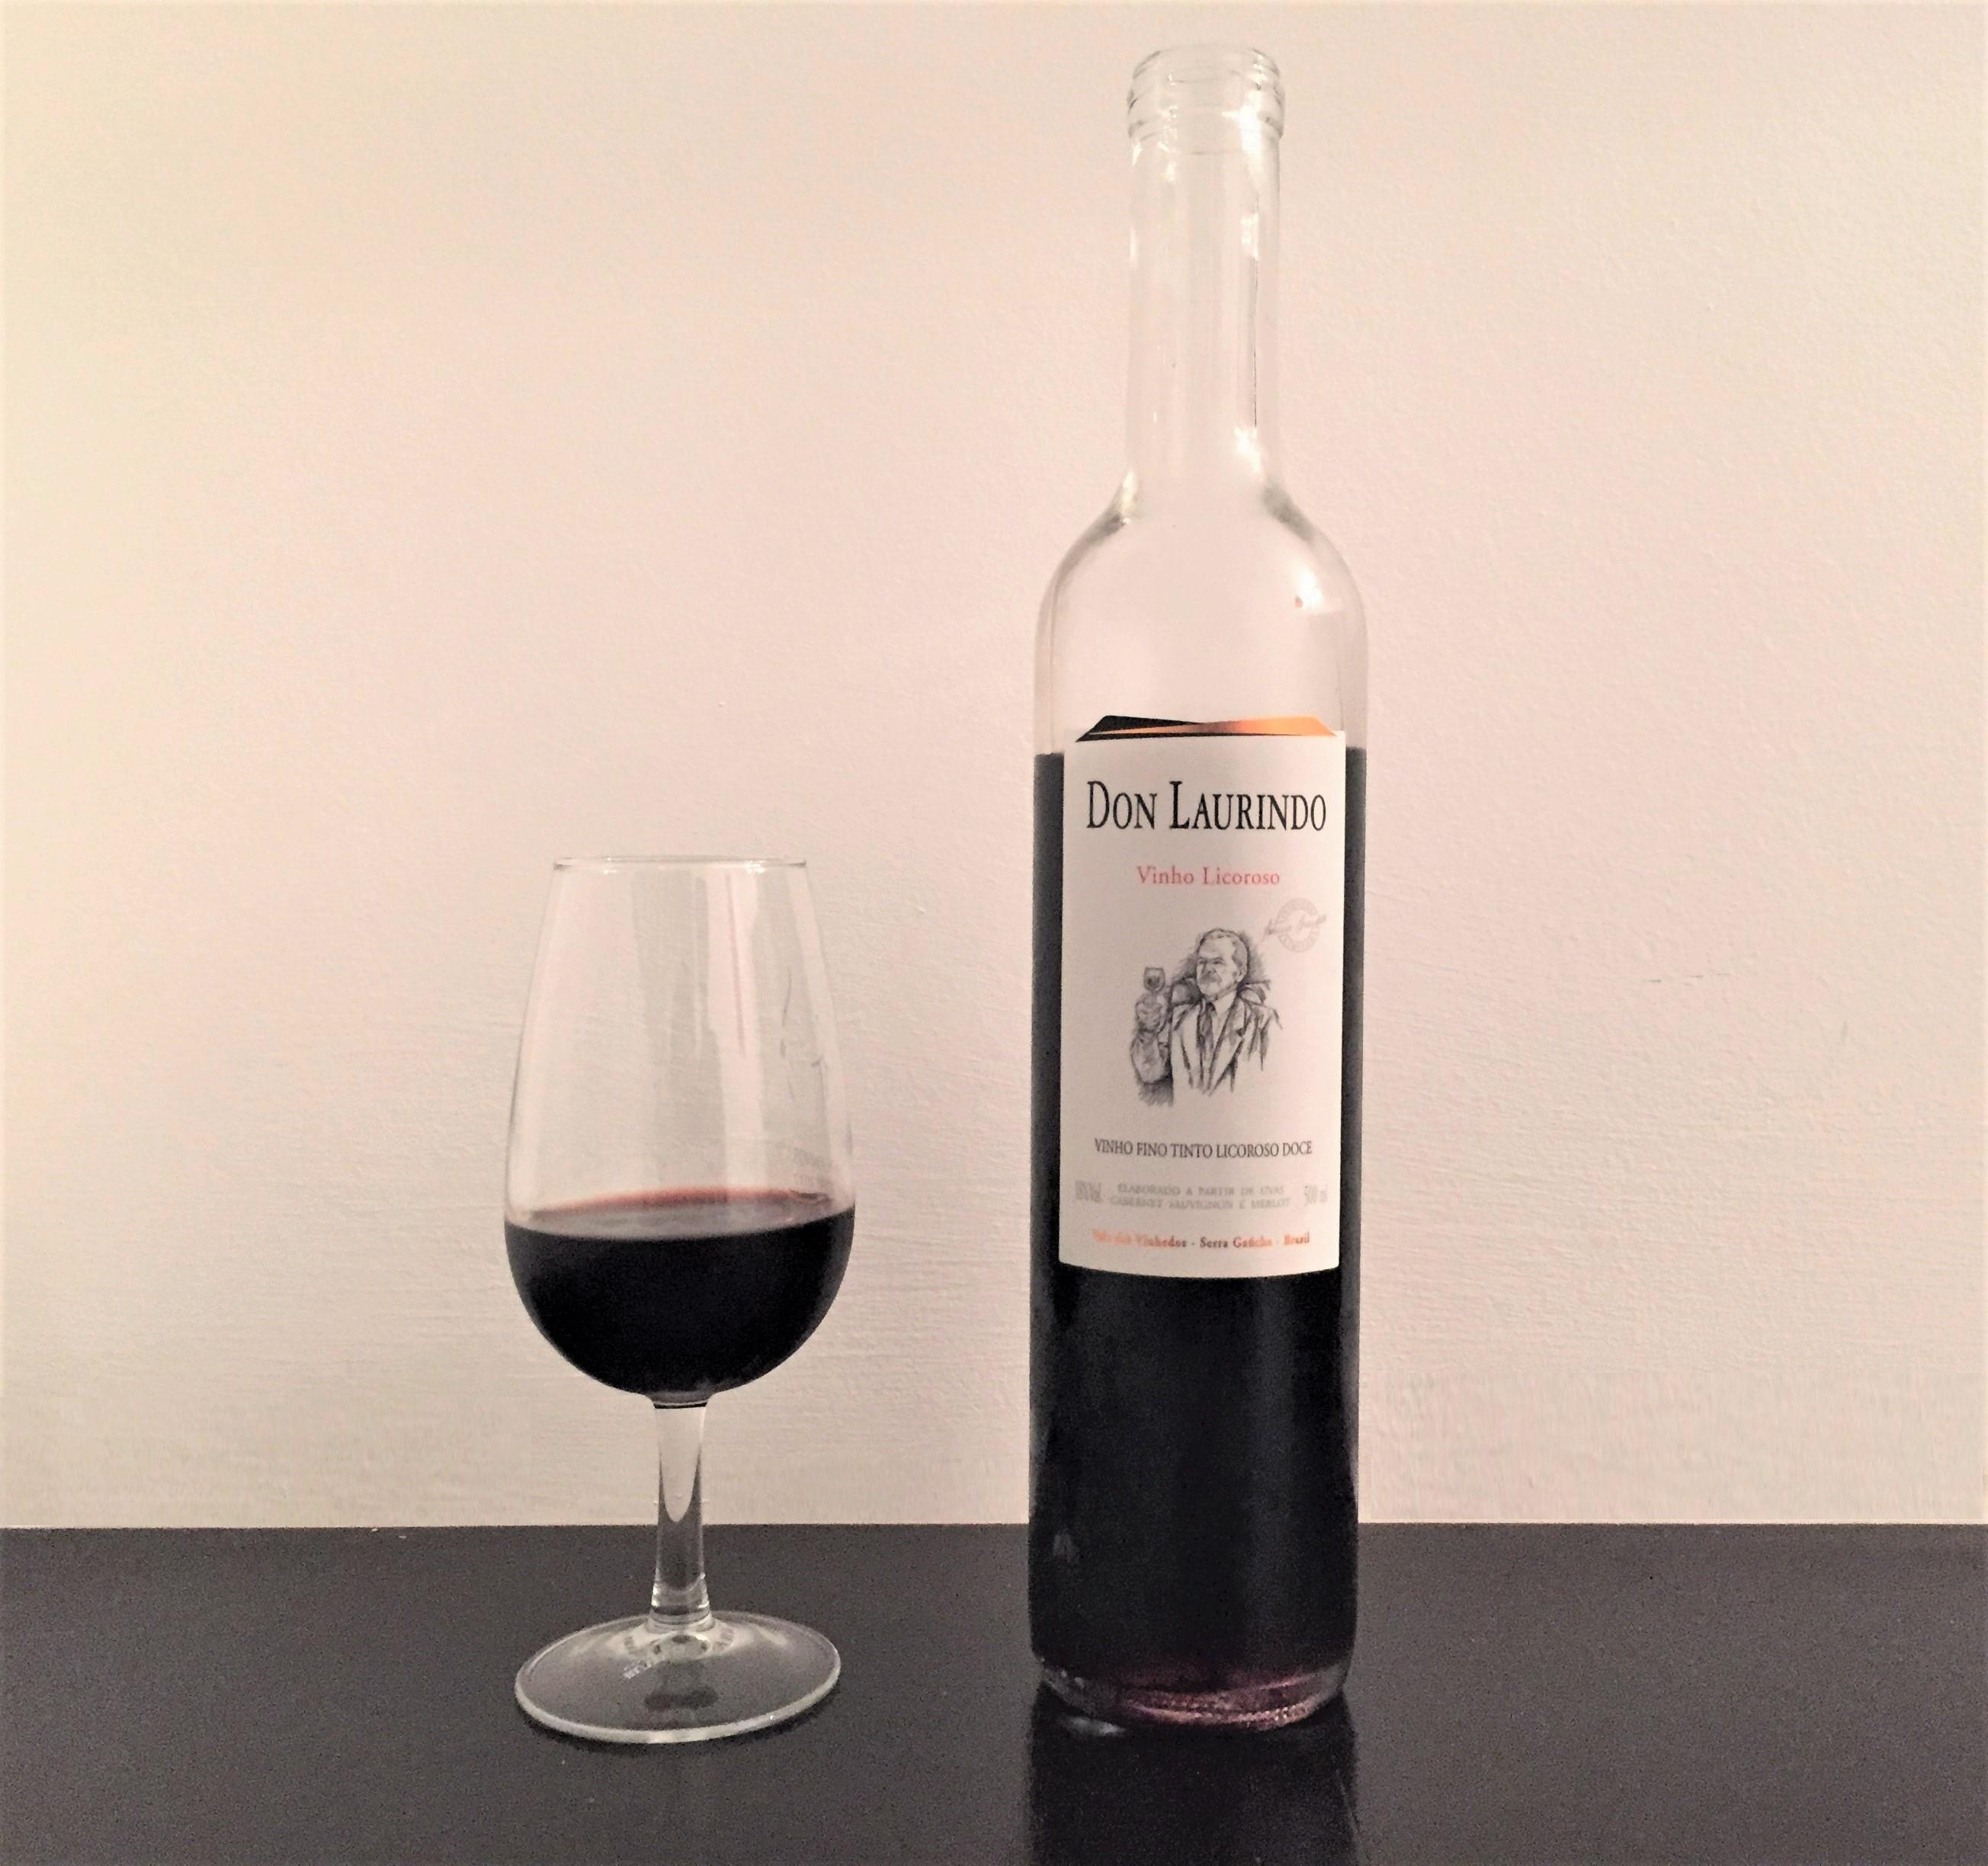 Vinho Licoroso Don Laurindo